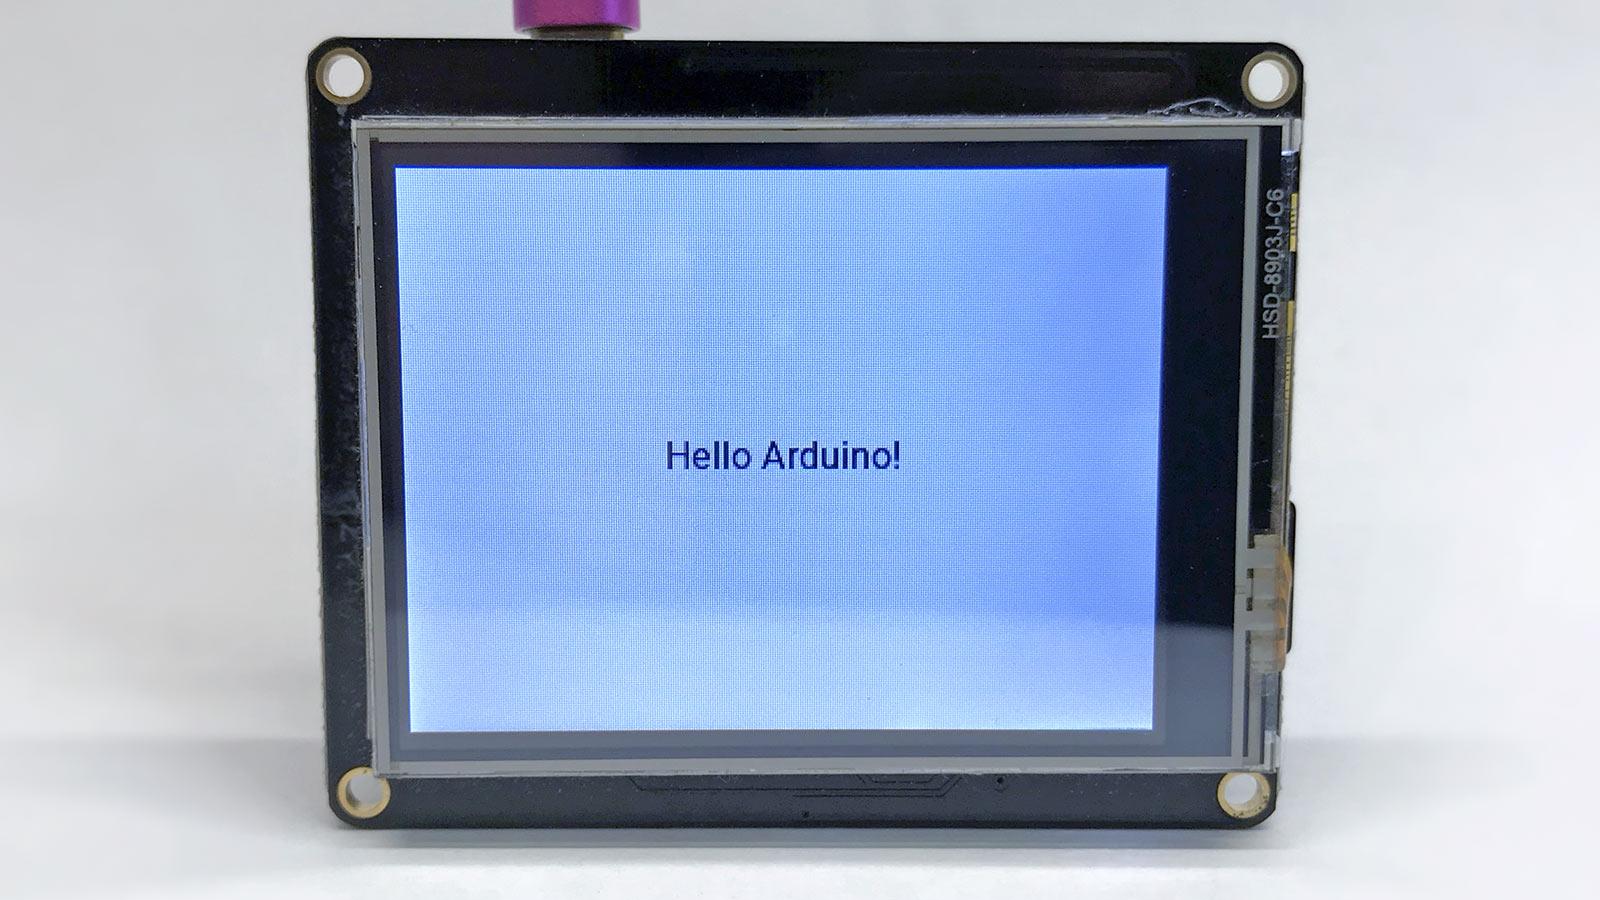 lcds___displays_hello_arduino.jpg